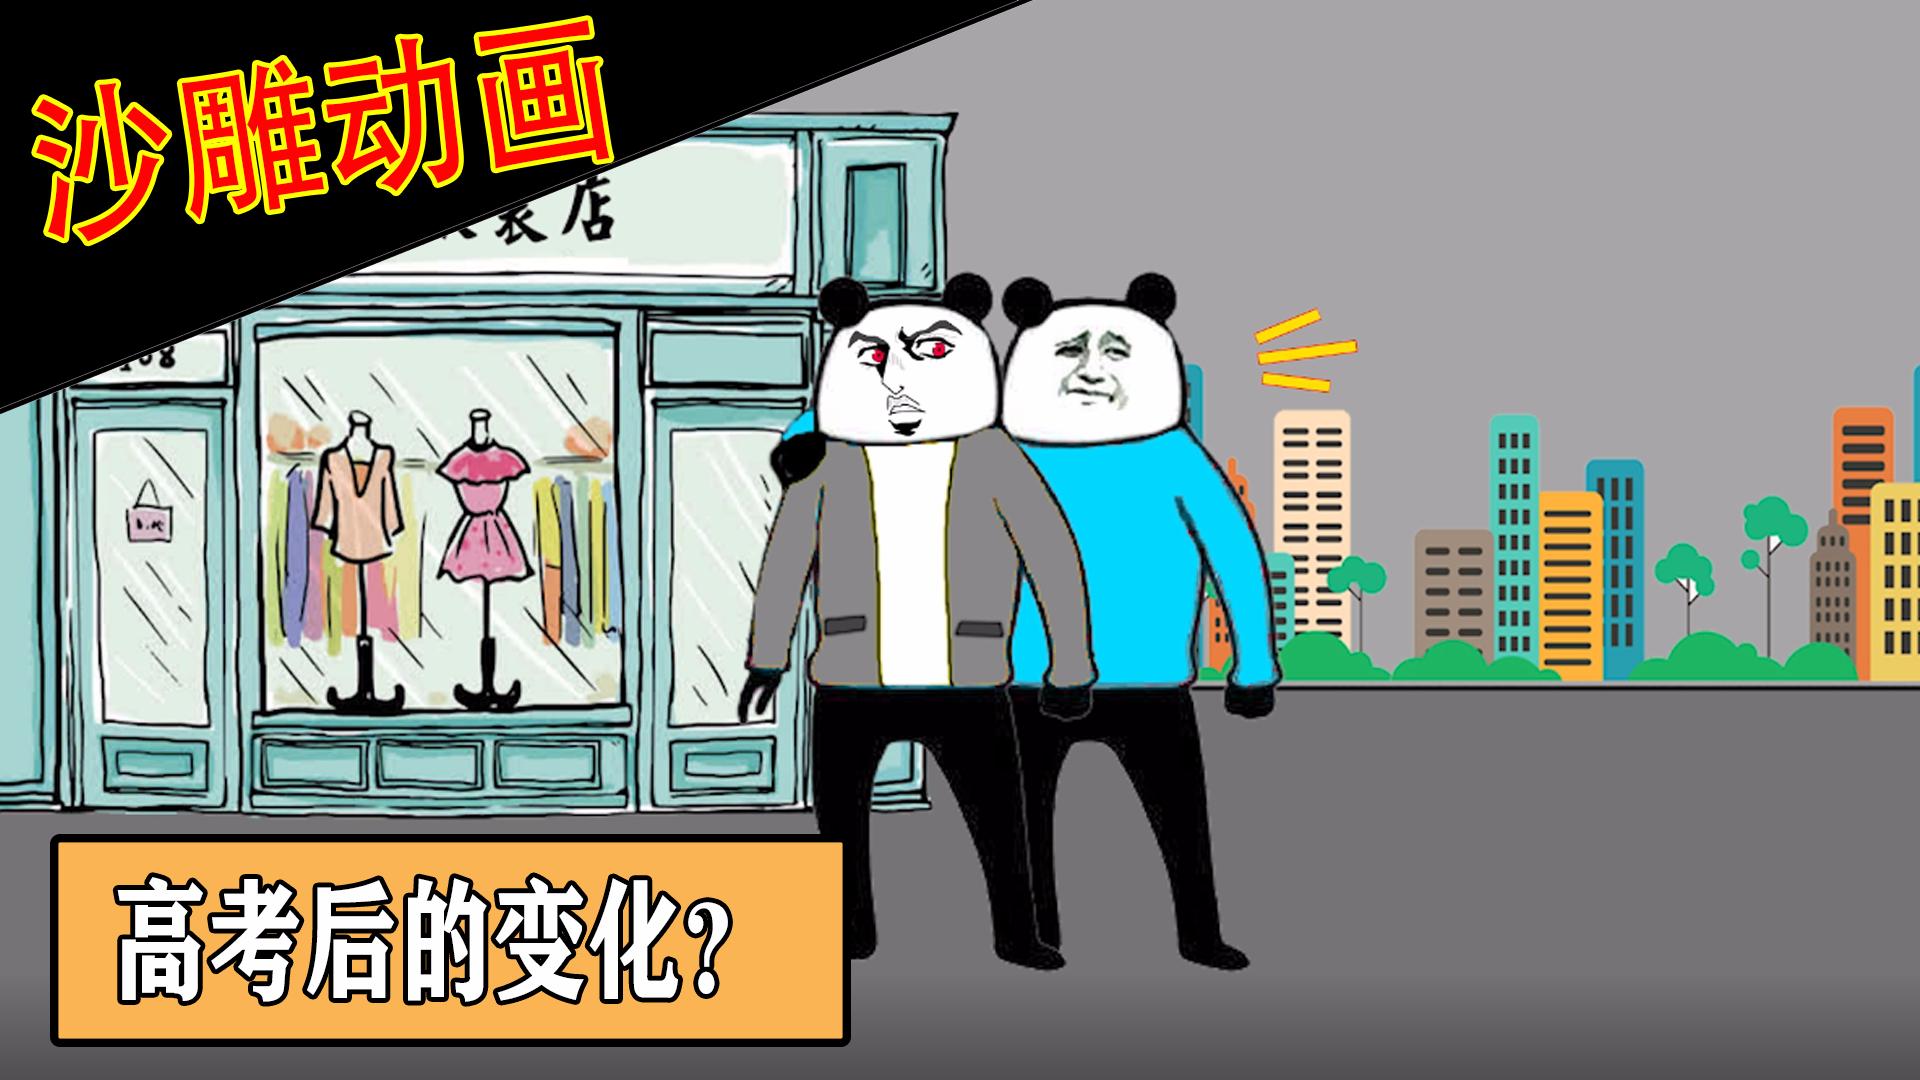 【沙雕动画】高考后会发生の变化?(上)